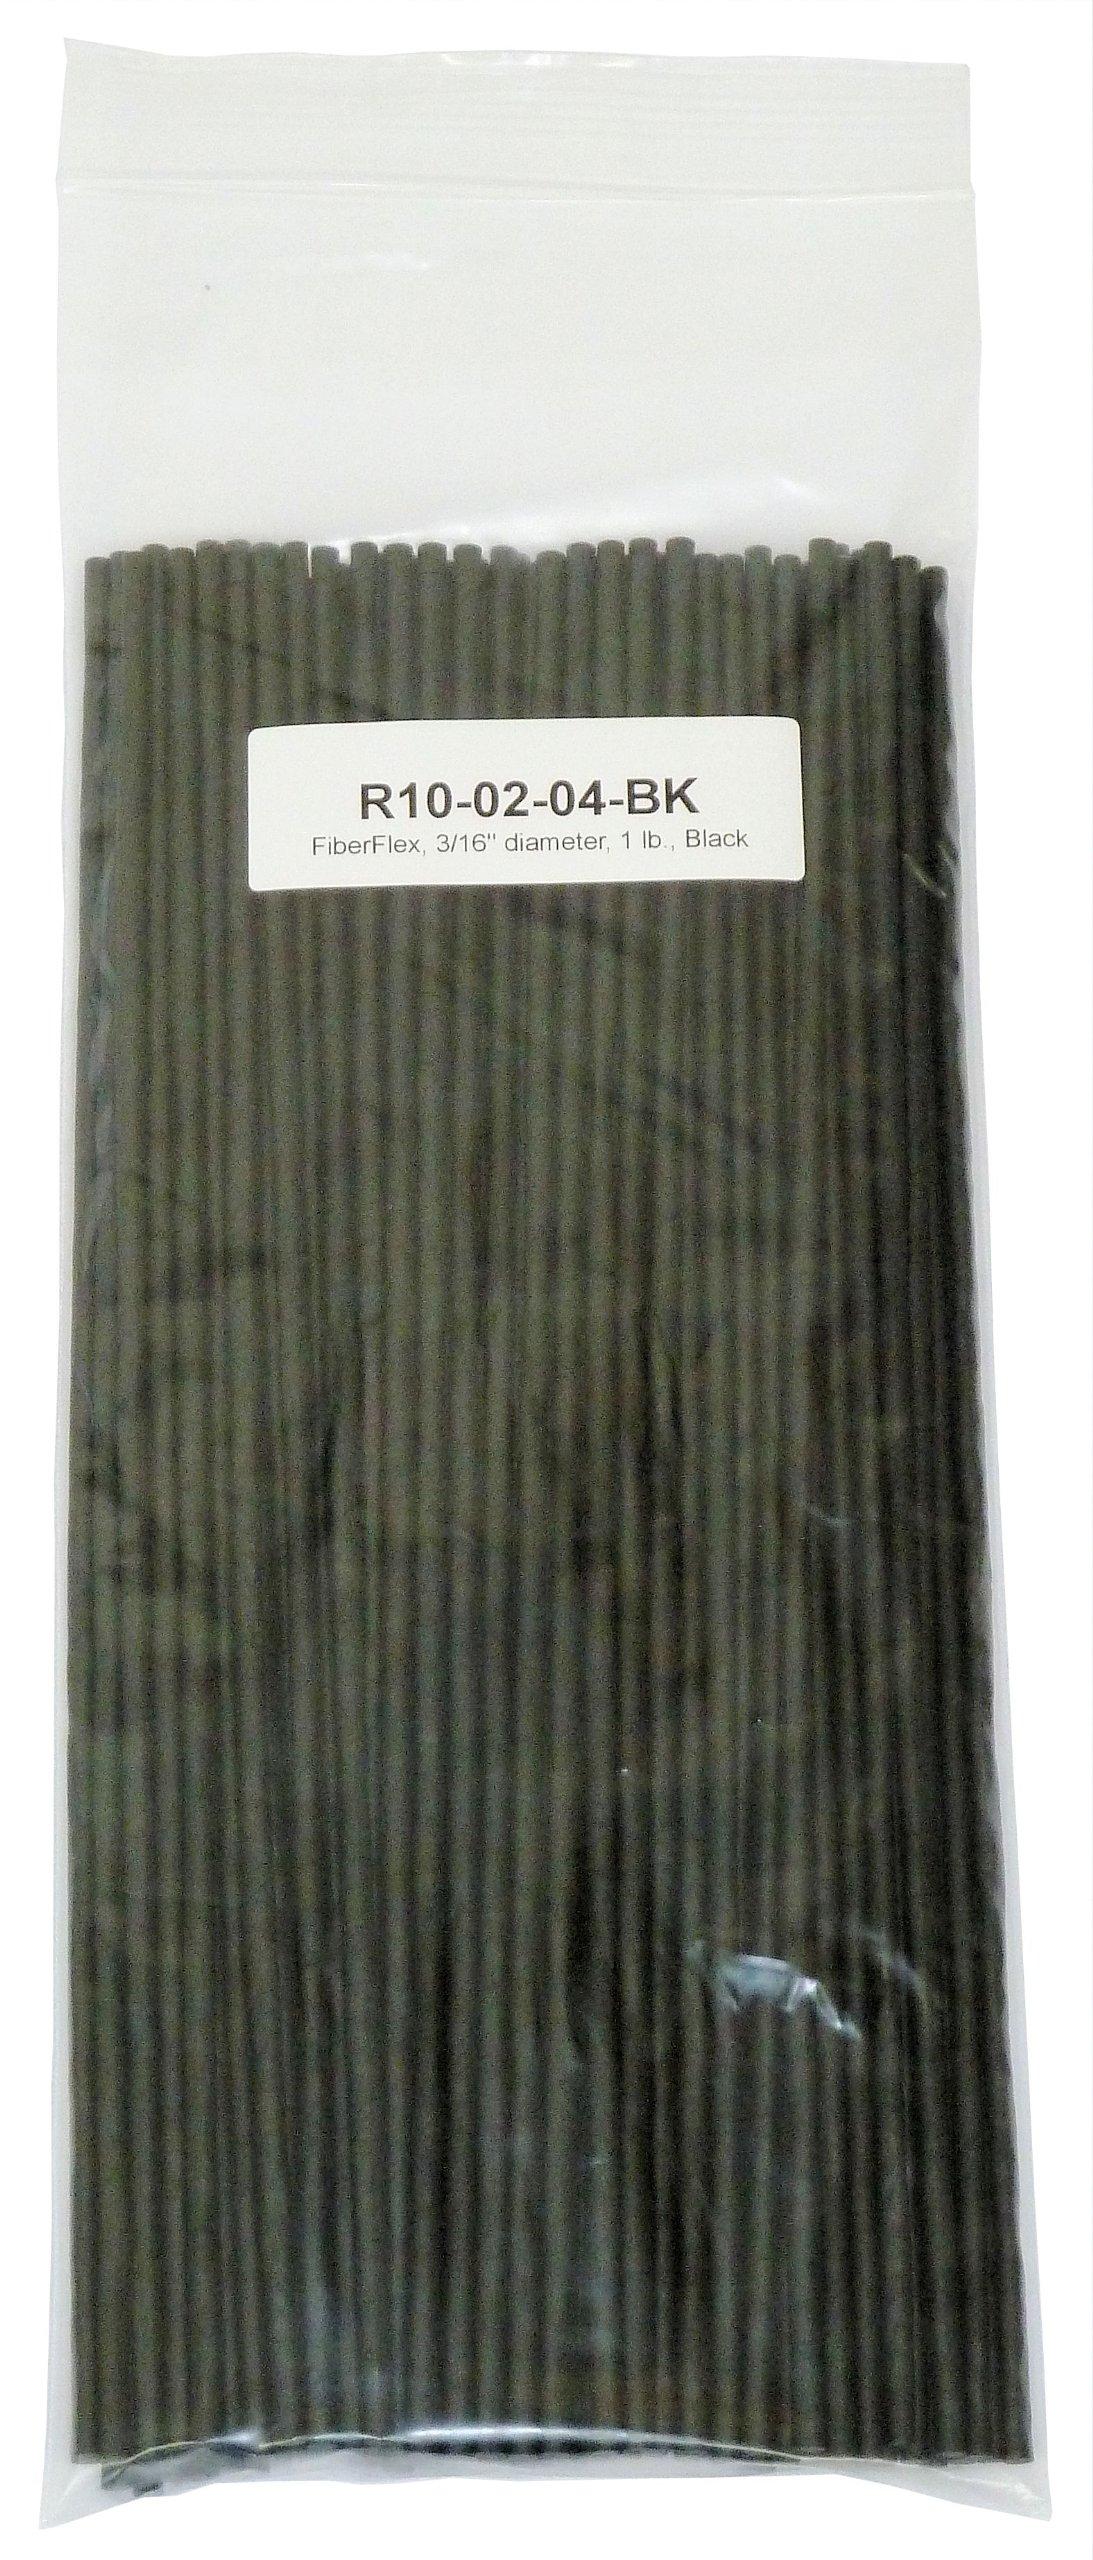 "Polyvance FiberFlex Plastic Welding Rod, 3/16"" Diameter, 1 lb, Black"